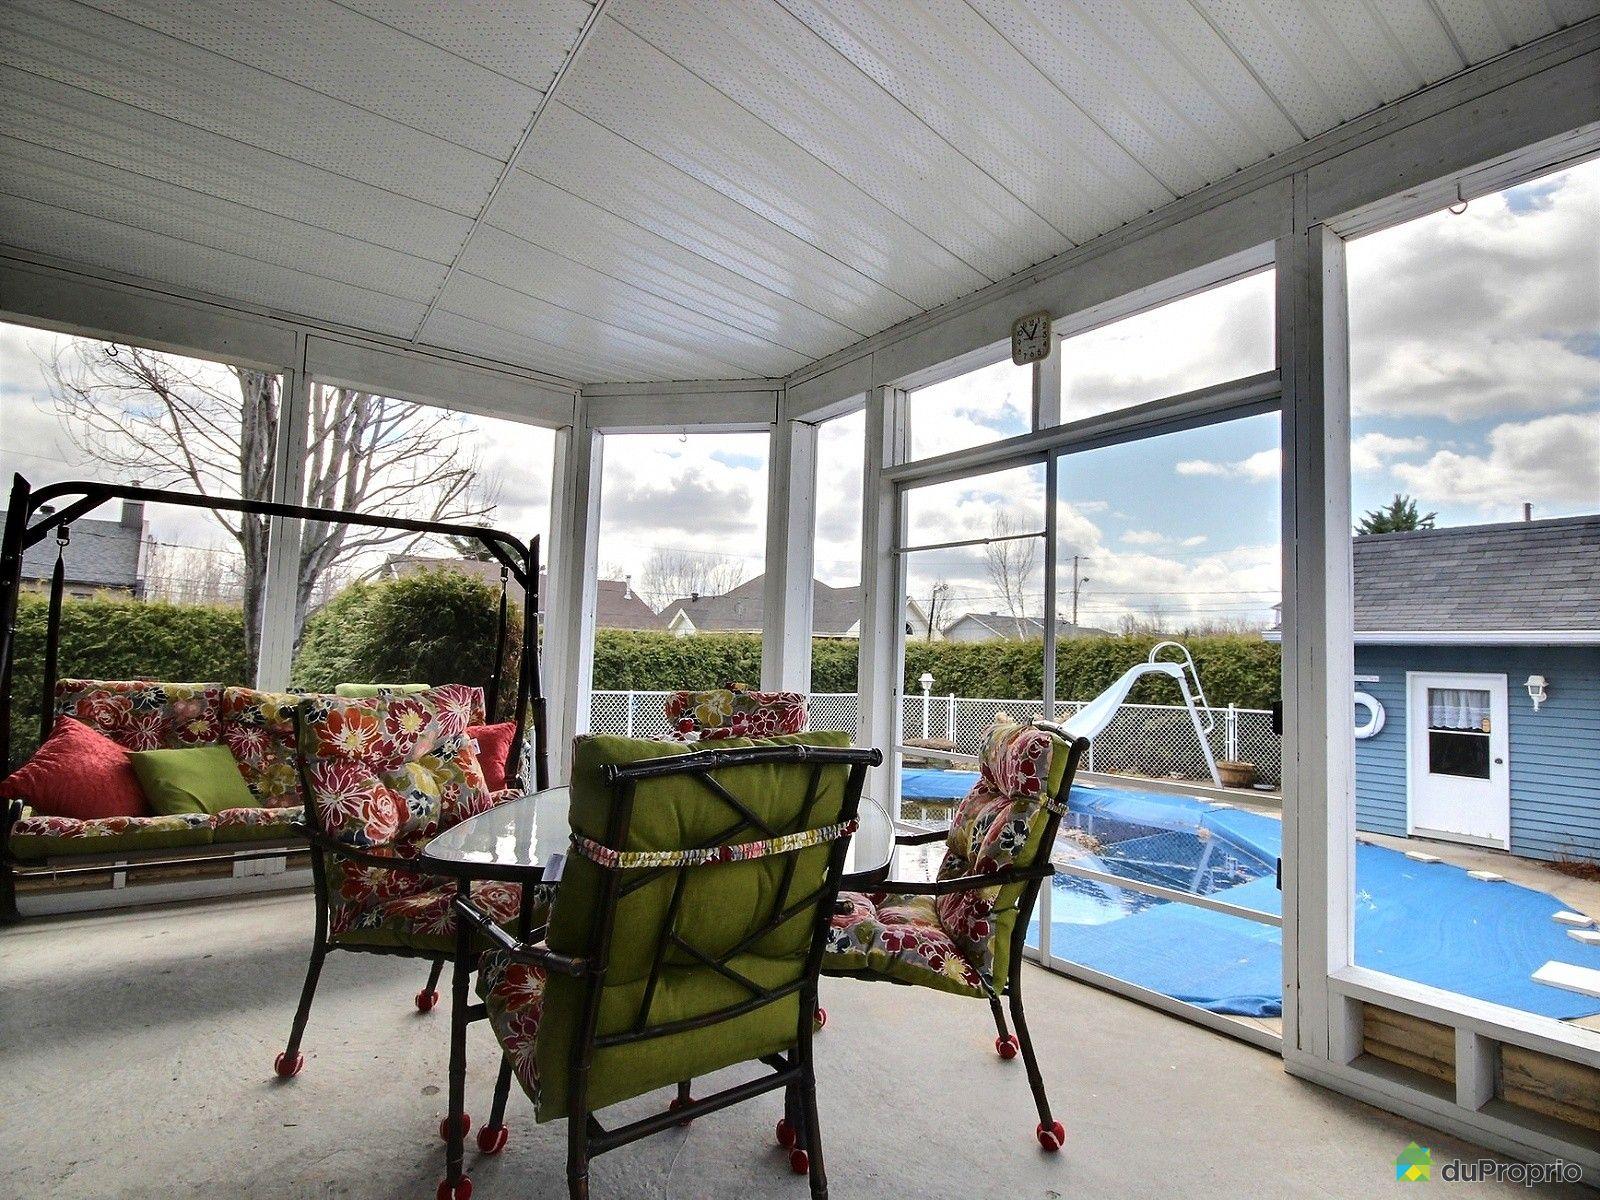 Maison vendre shawinigan sud 2440 avenue adrienne for Club piscine shawinigan sud